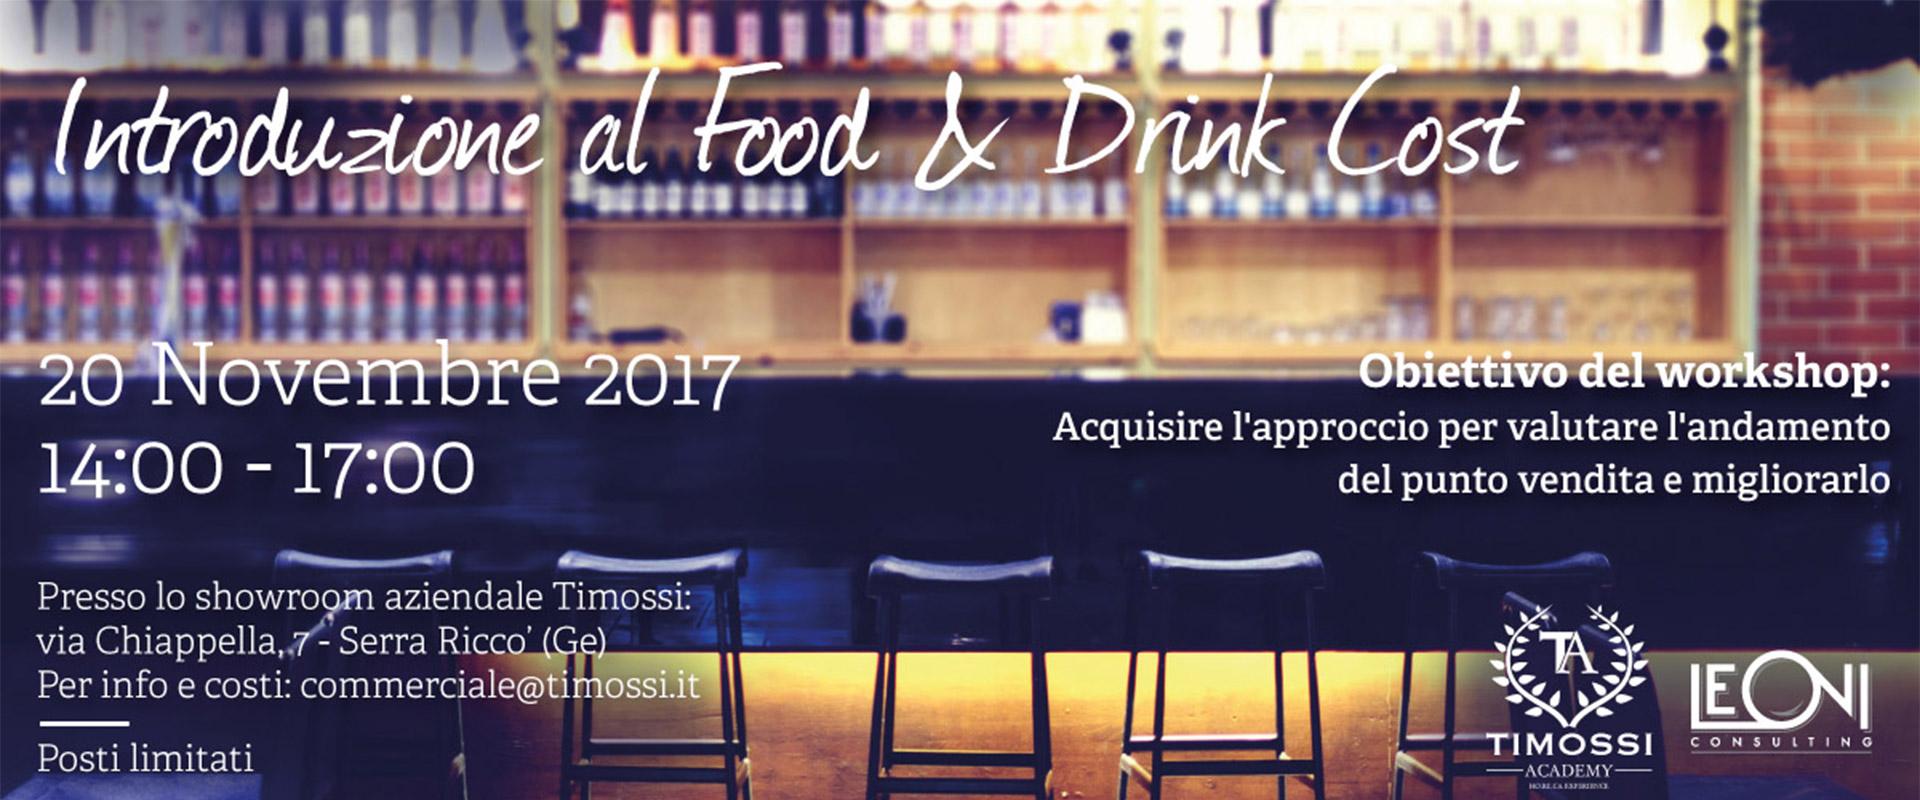 Nuovo appuntamento della Timossi Academy: Introduzione al Food&Drink Cost